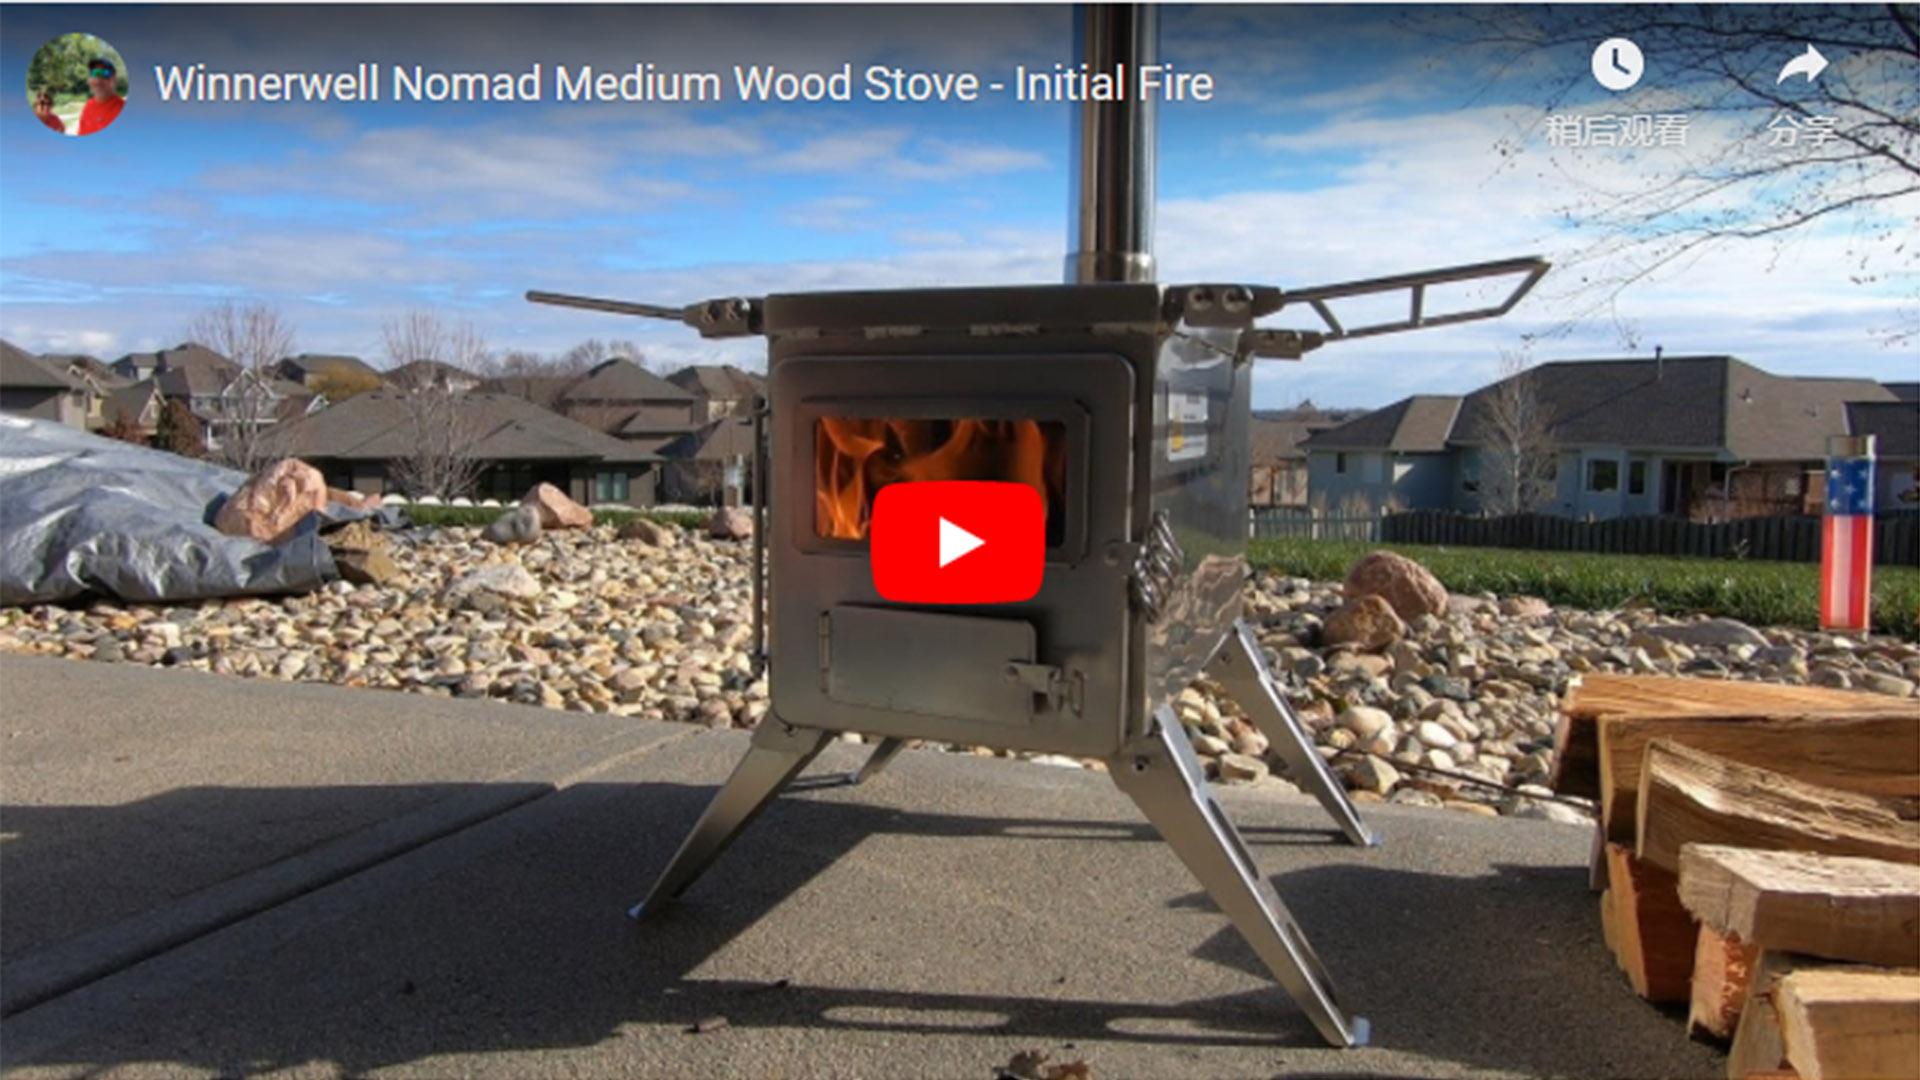 Winnerwell Nomad Medium Wood Stove – Initial Fire 2